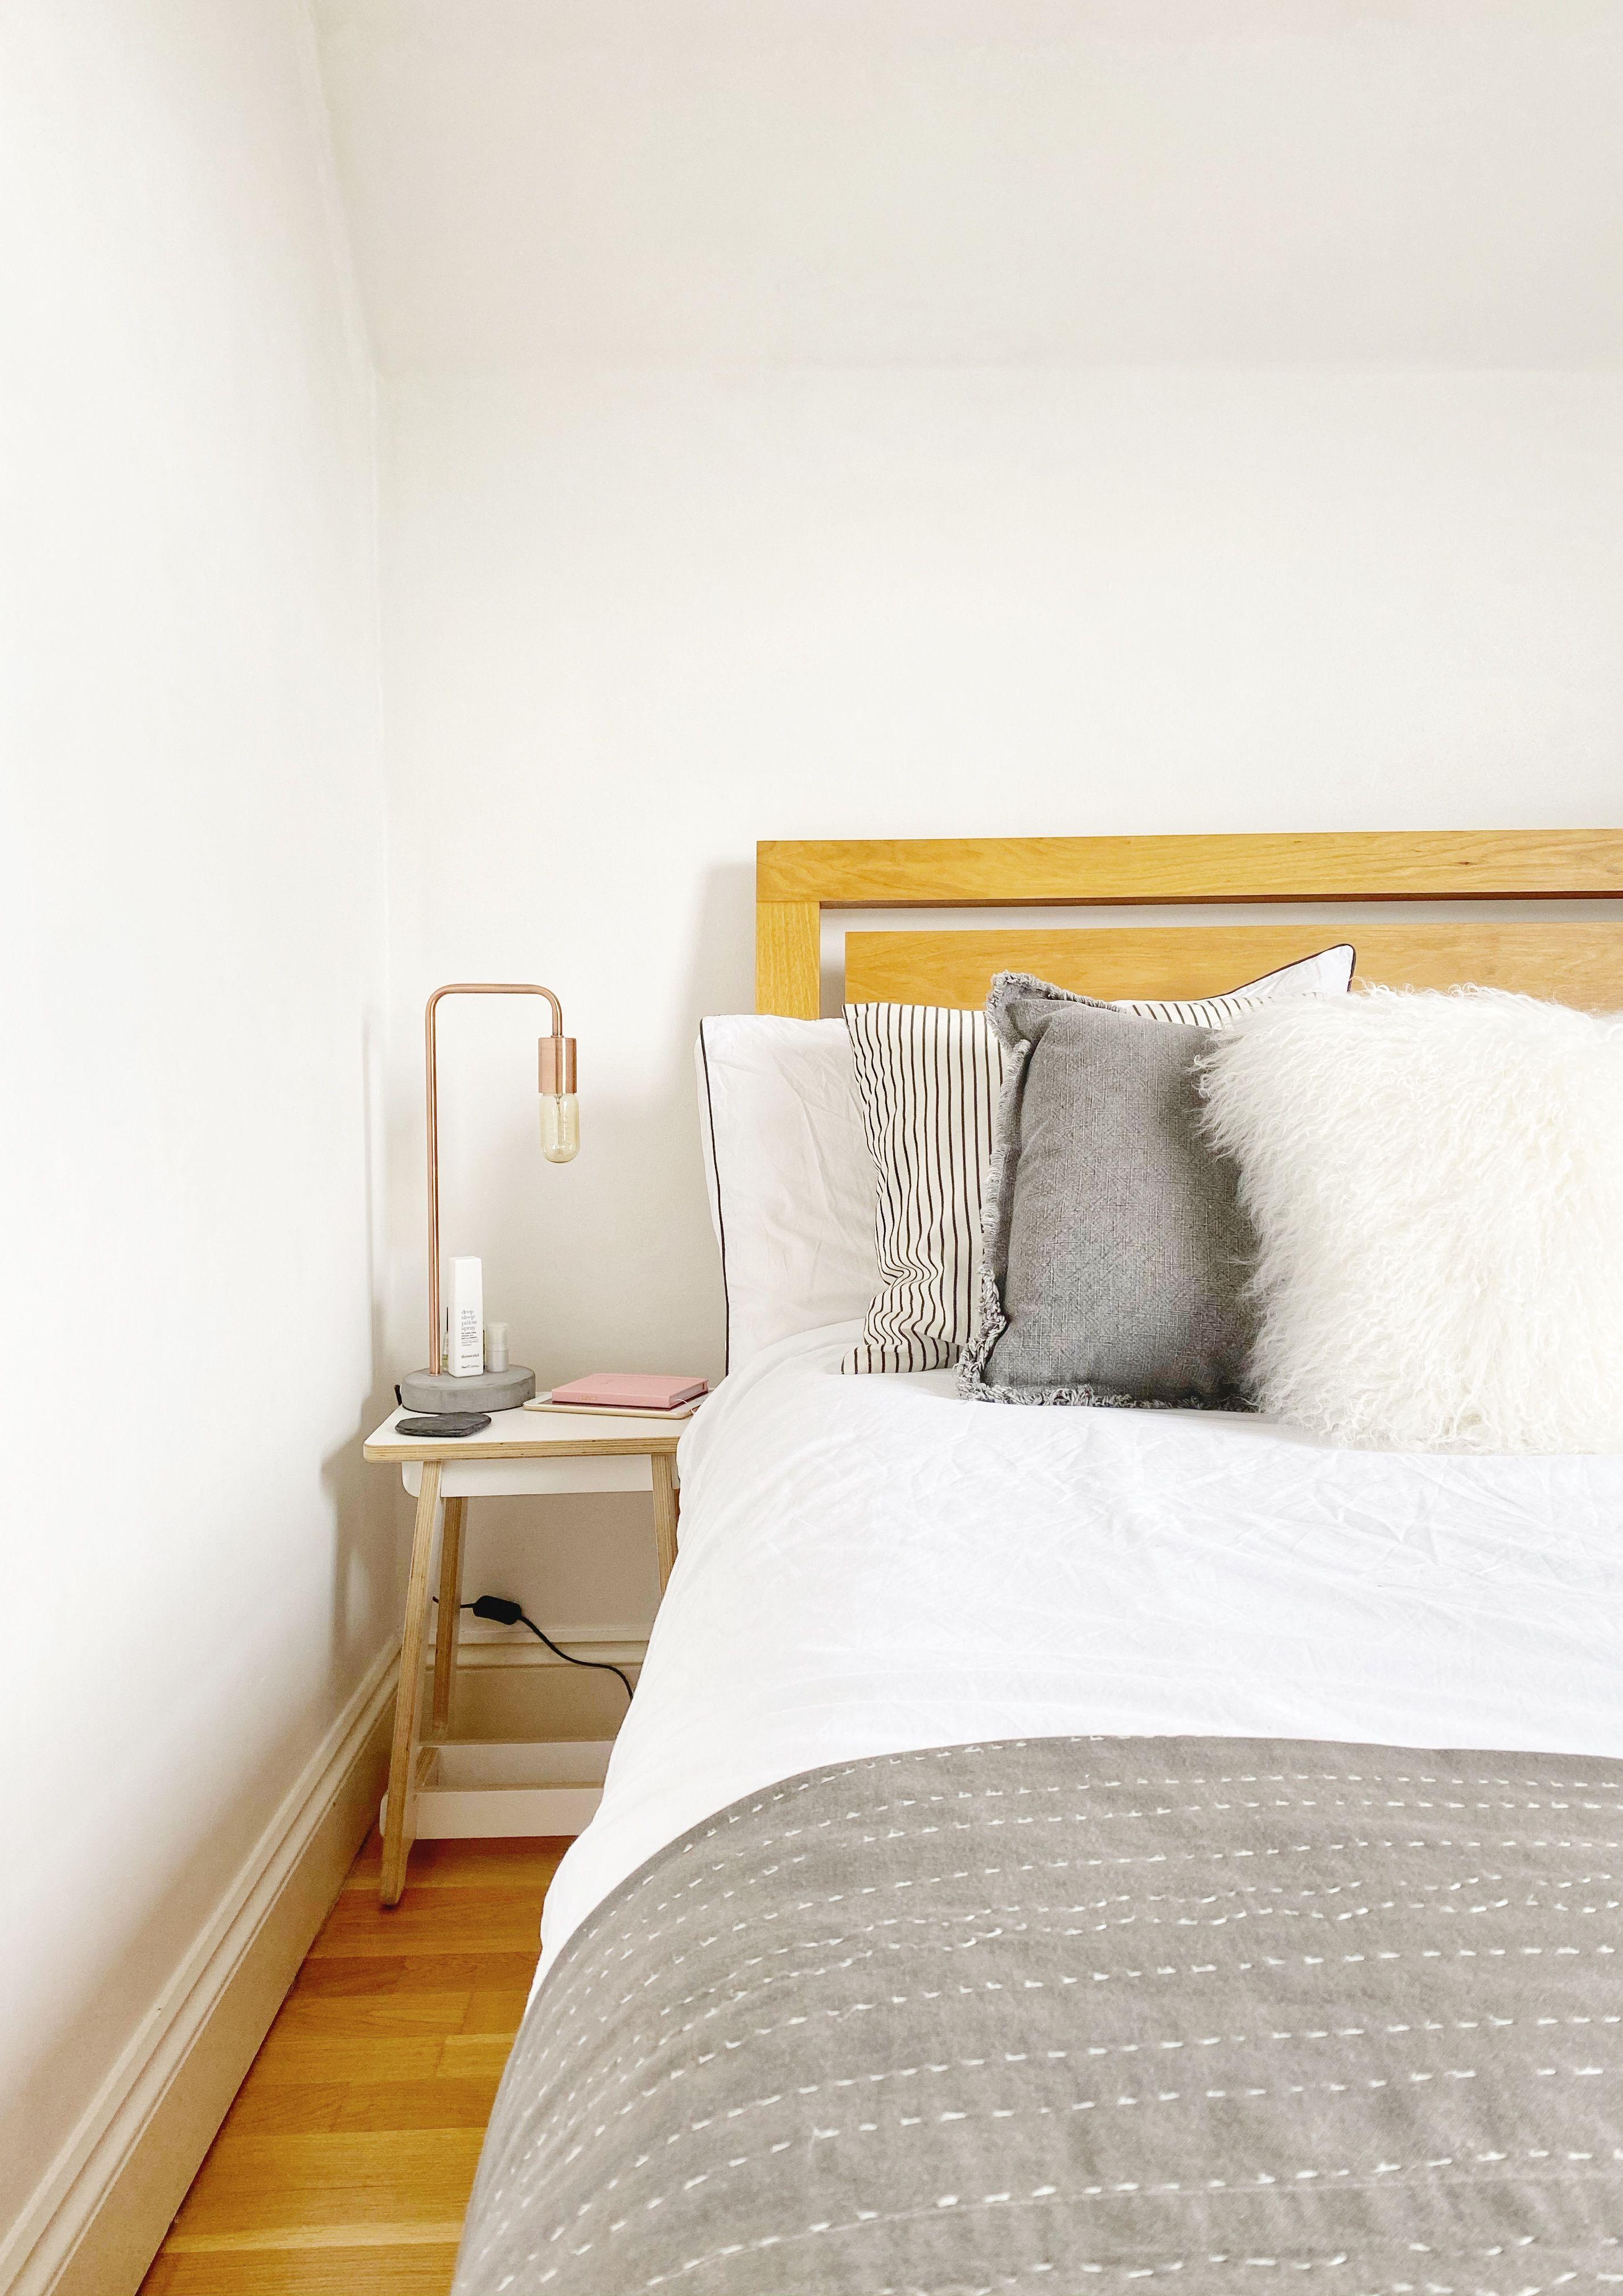 Nothing better than fresh bed sheets! ✨ 🛌 . . . . . #interiors #interiordesigns #londoninteriordesigner #instahome #bedroominspo #interior_and_living #primeinteriors